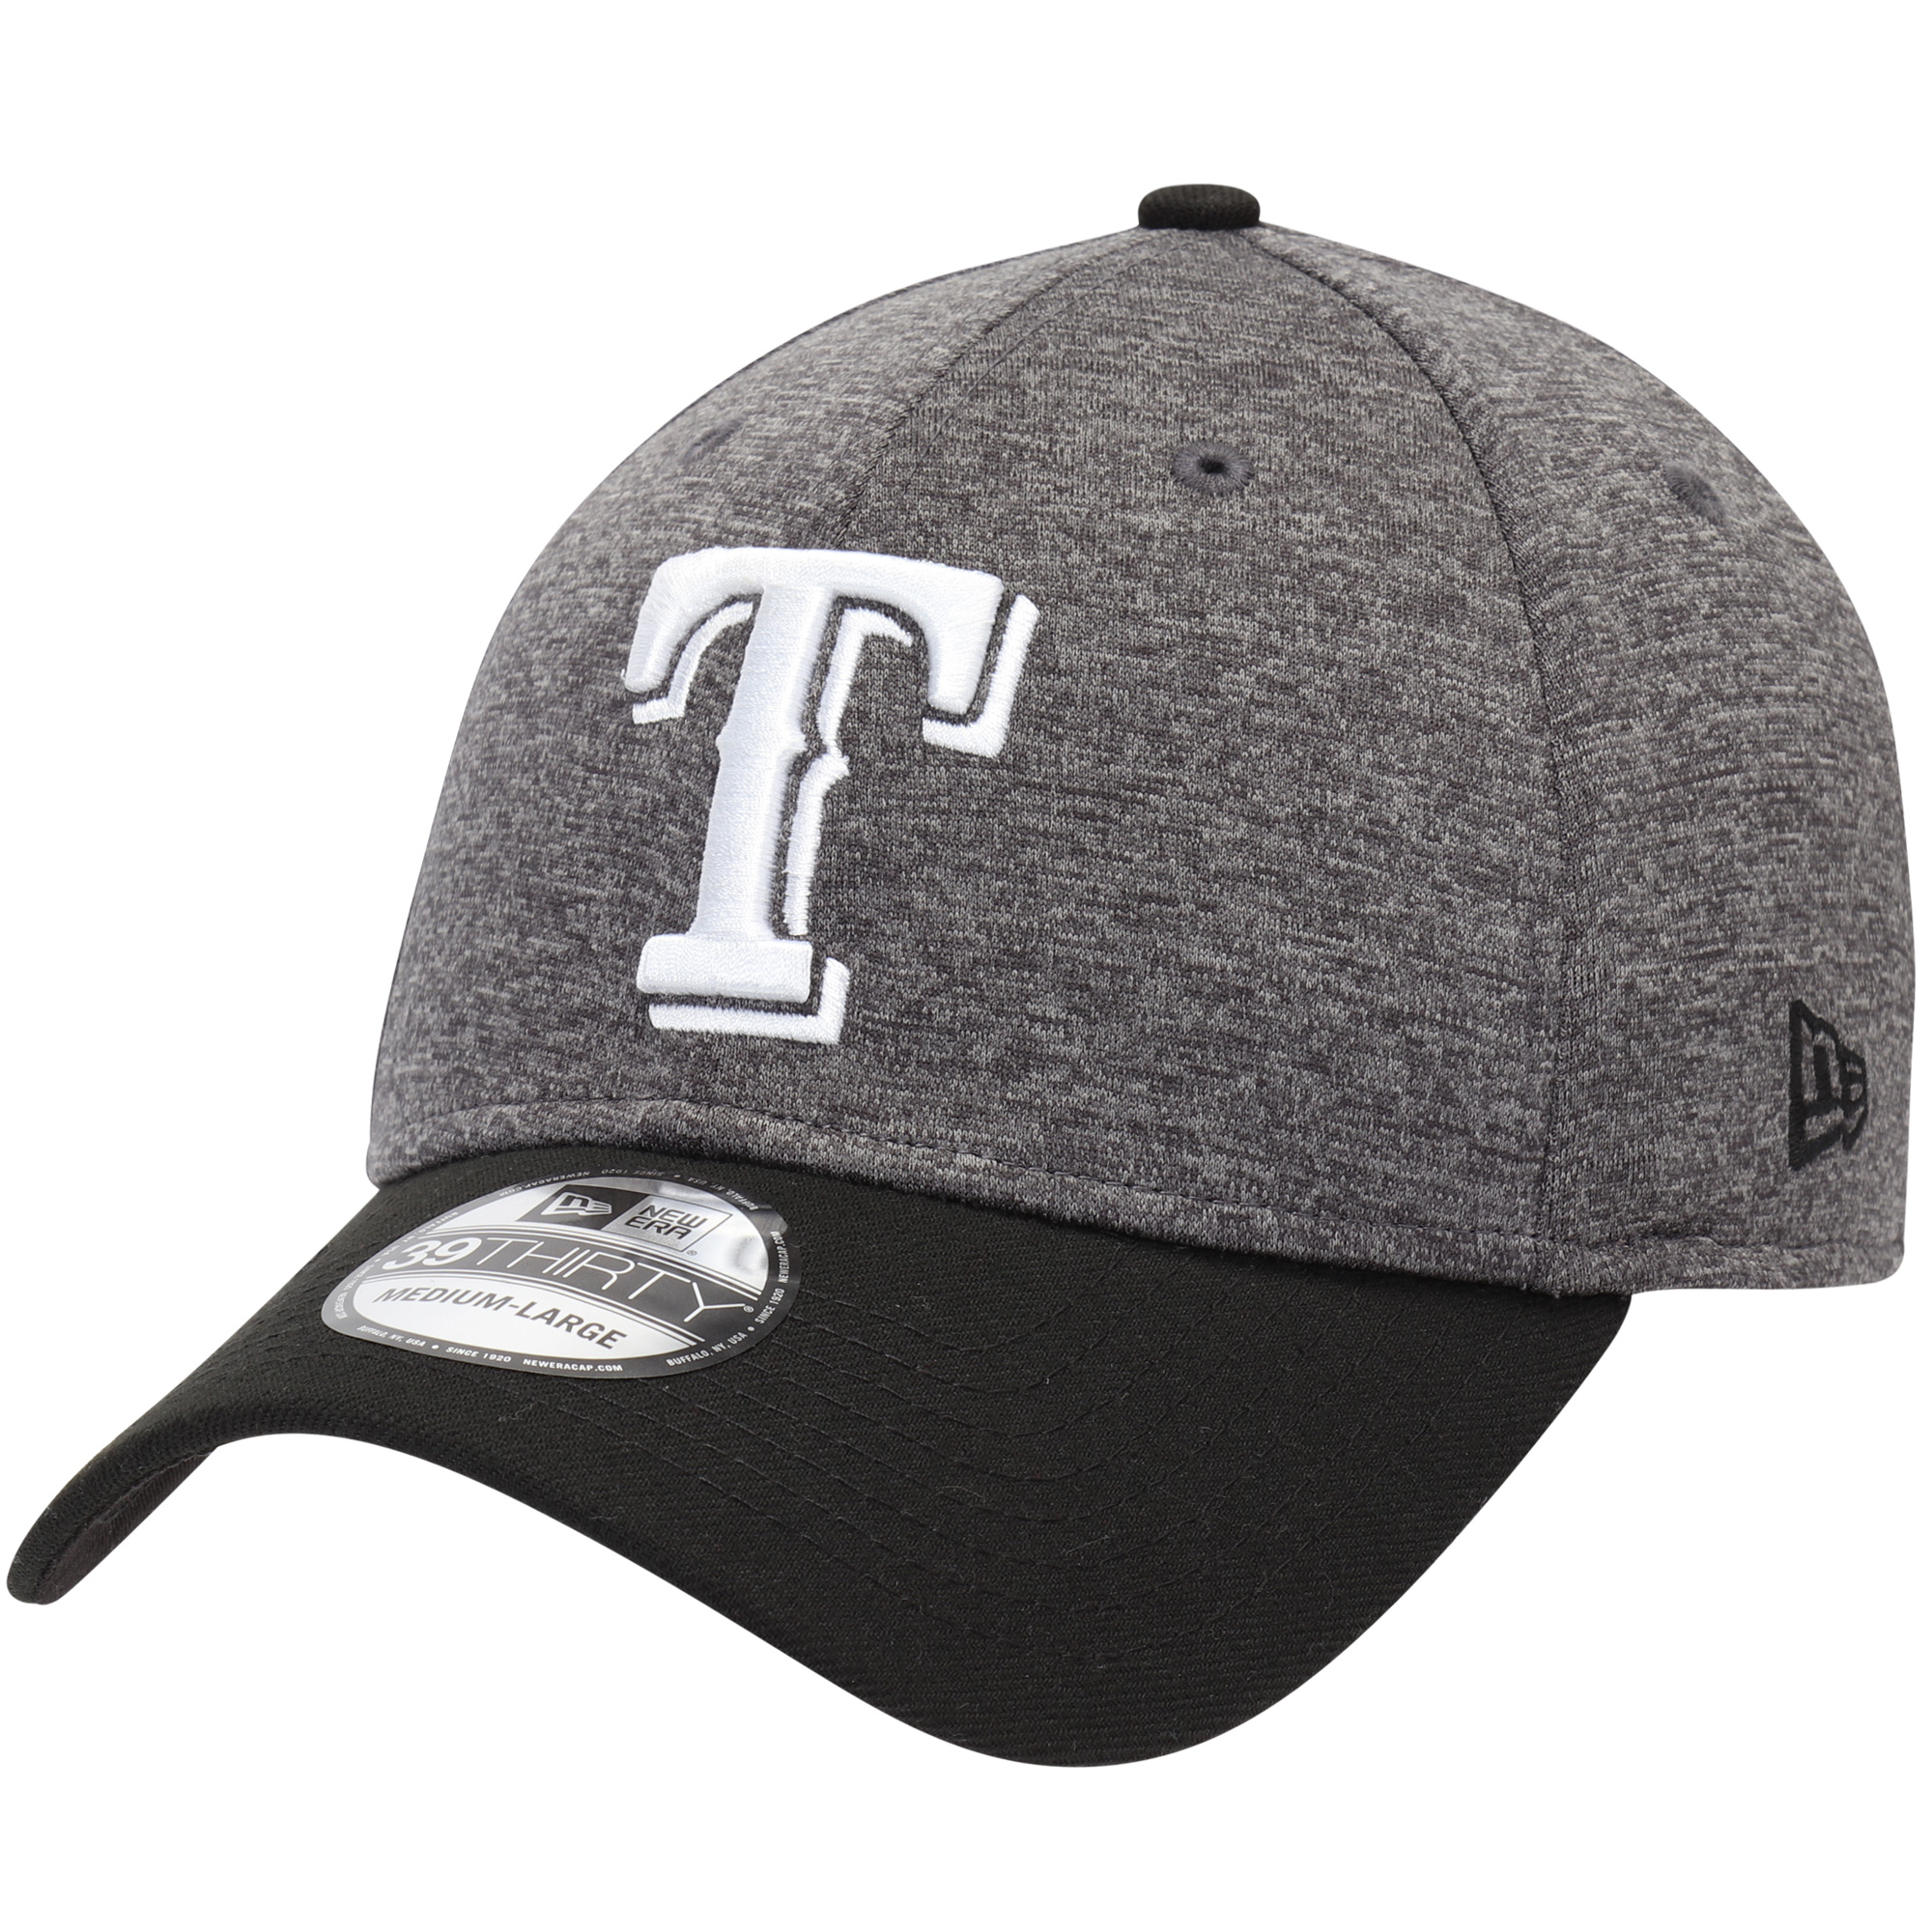 Texas Rangers New Era Shadow Tech 39THIRTY Flex Hat - Heathered Gray/Black